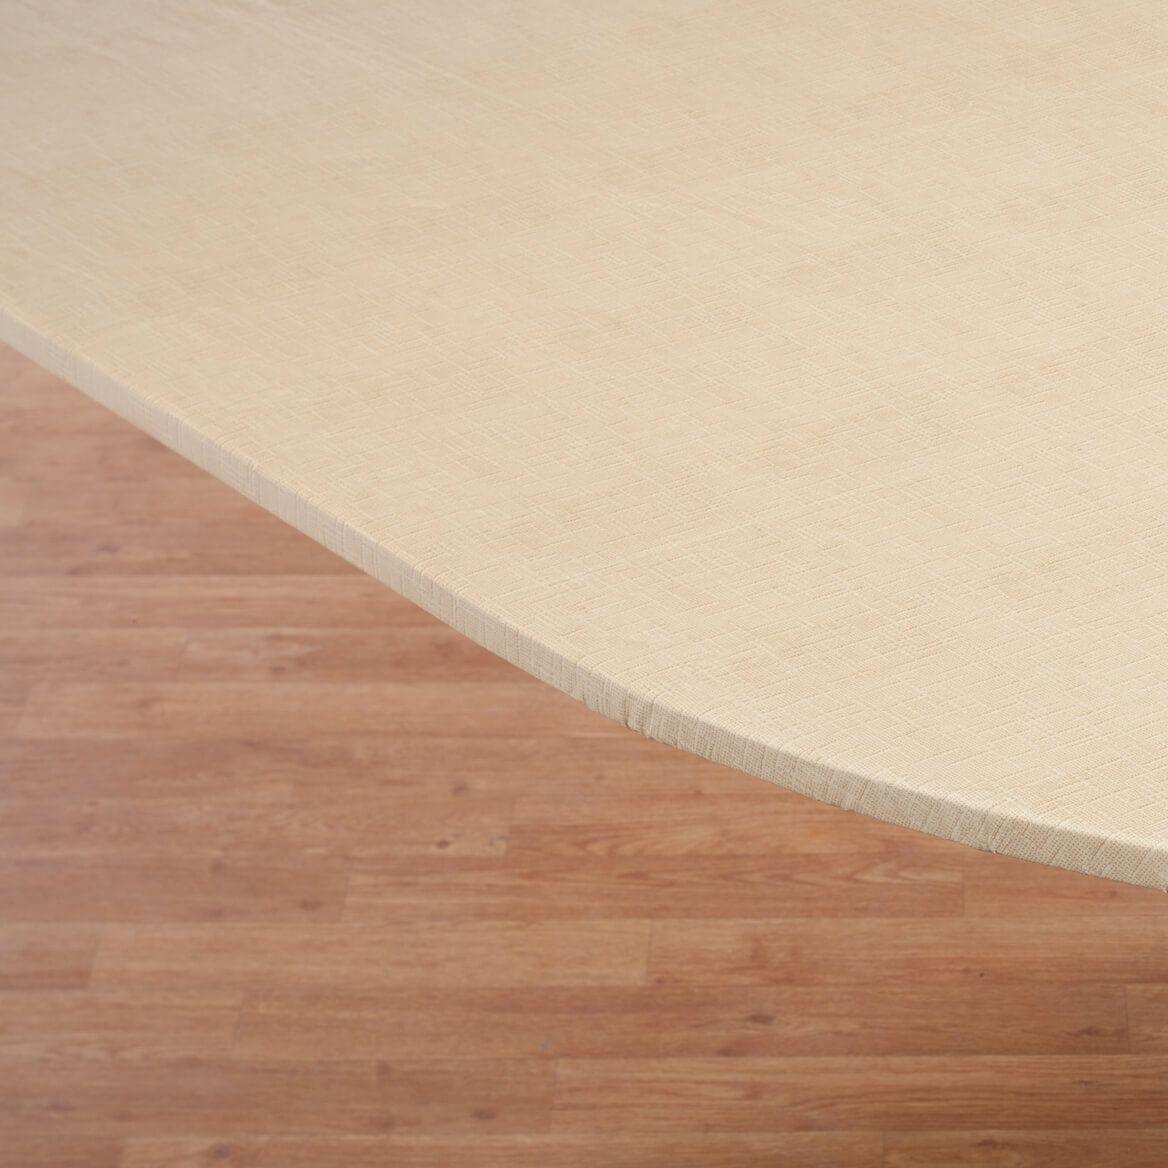 Illusion Weave Vinyl Elasticized Tablecovers-356713